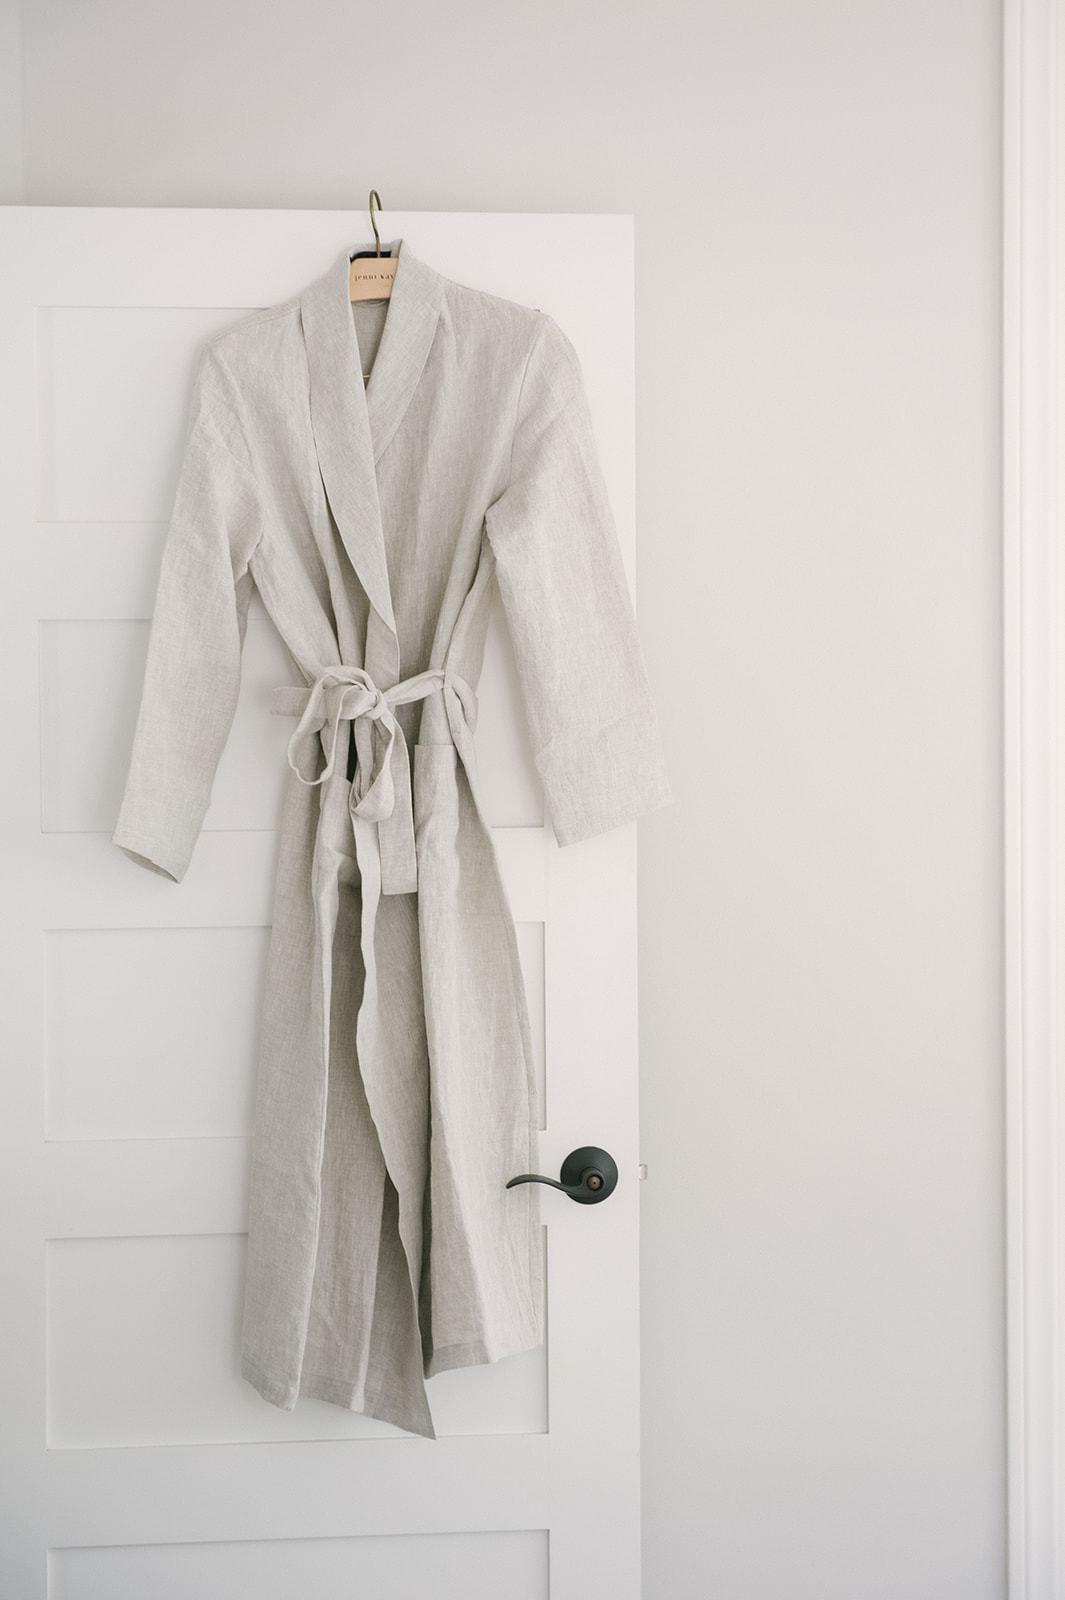 Jenni Kayne linen robe with gray wall backdrop